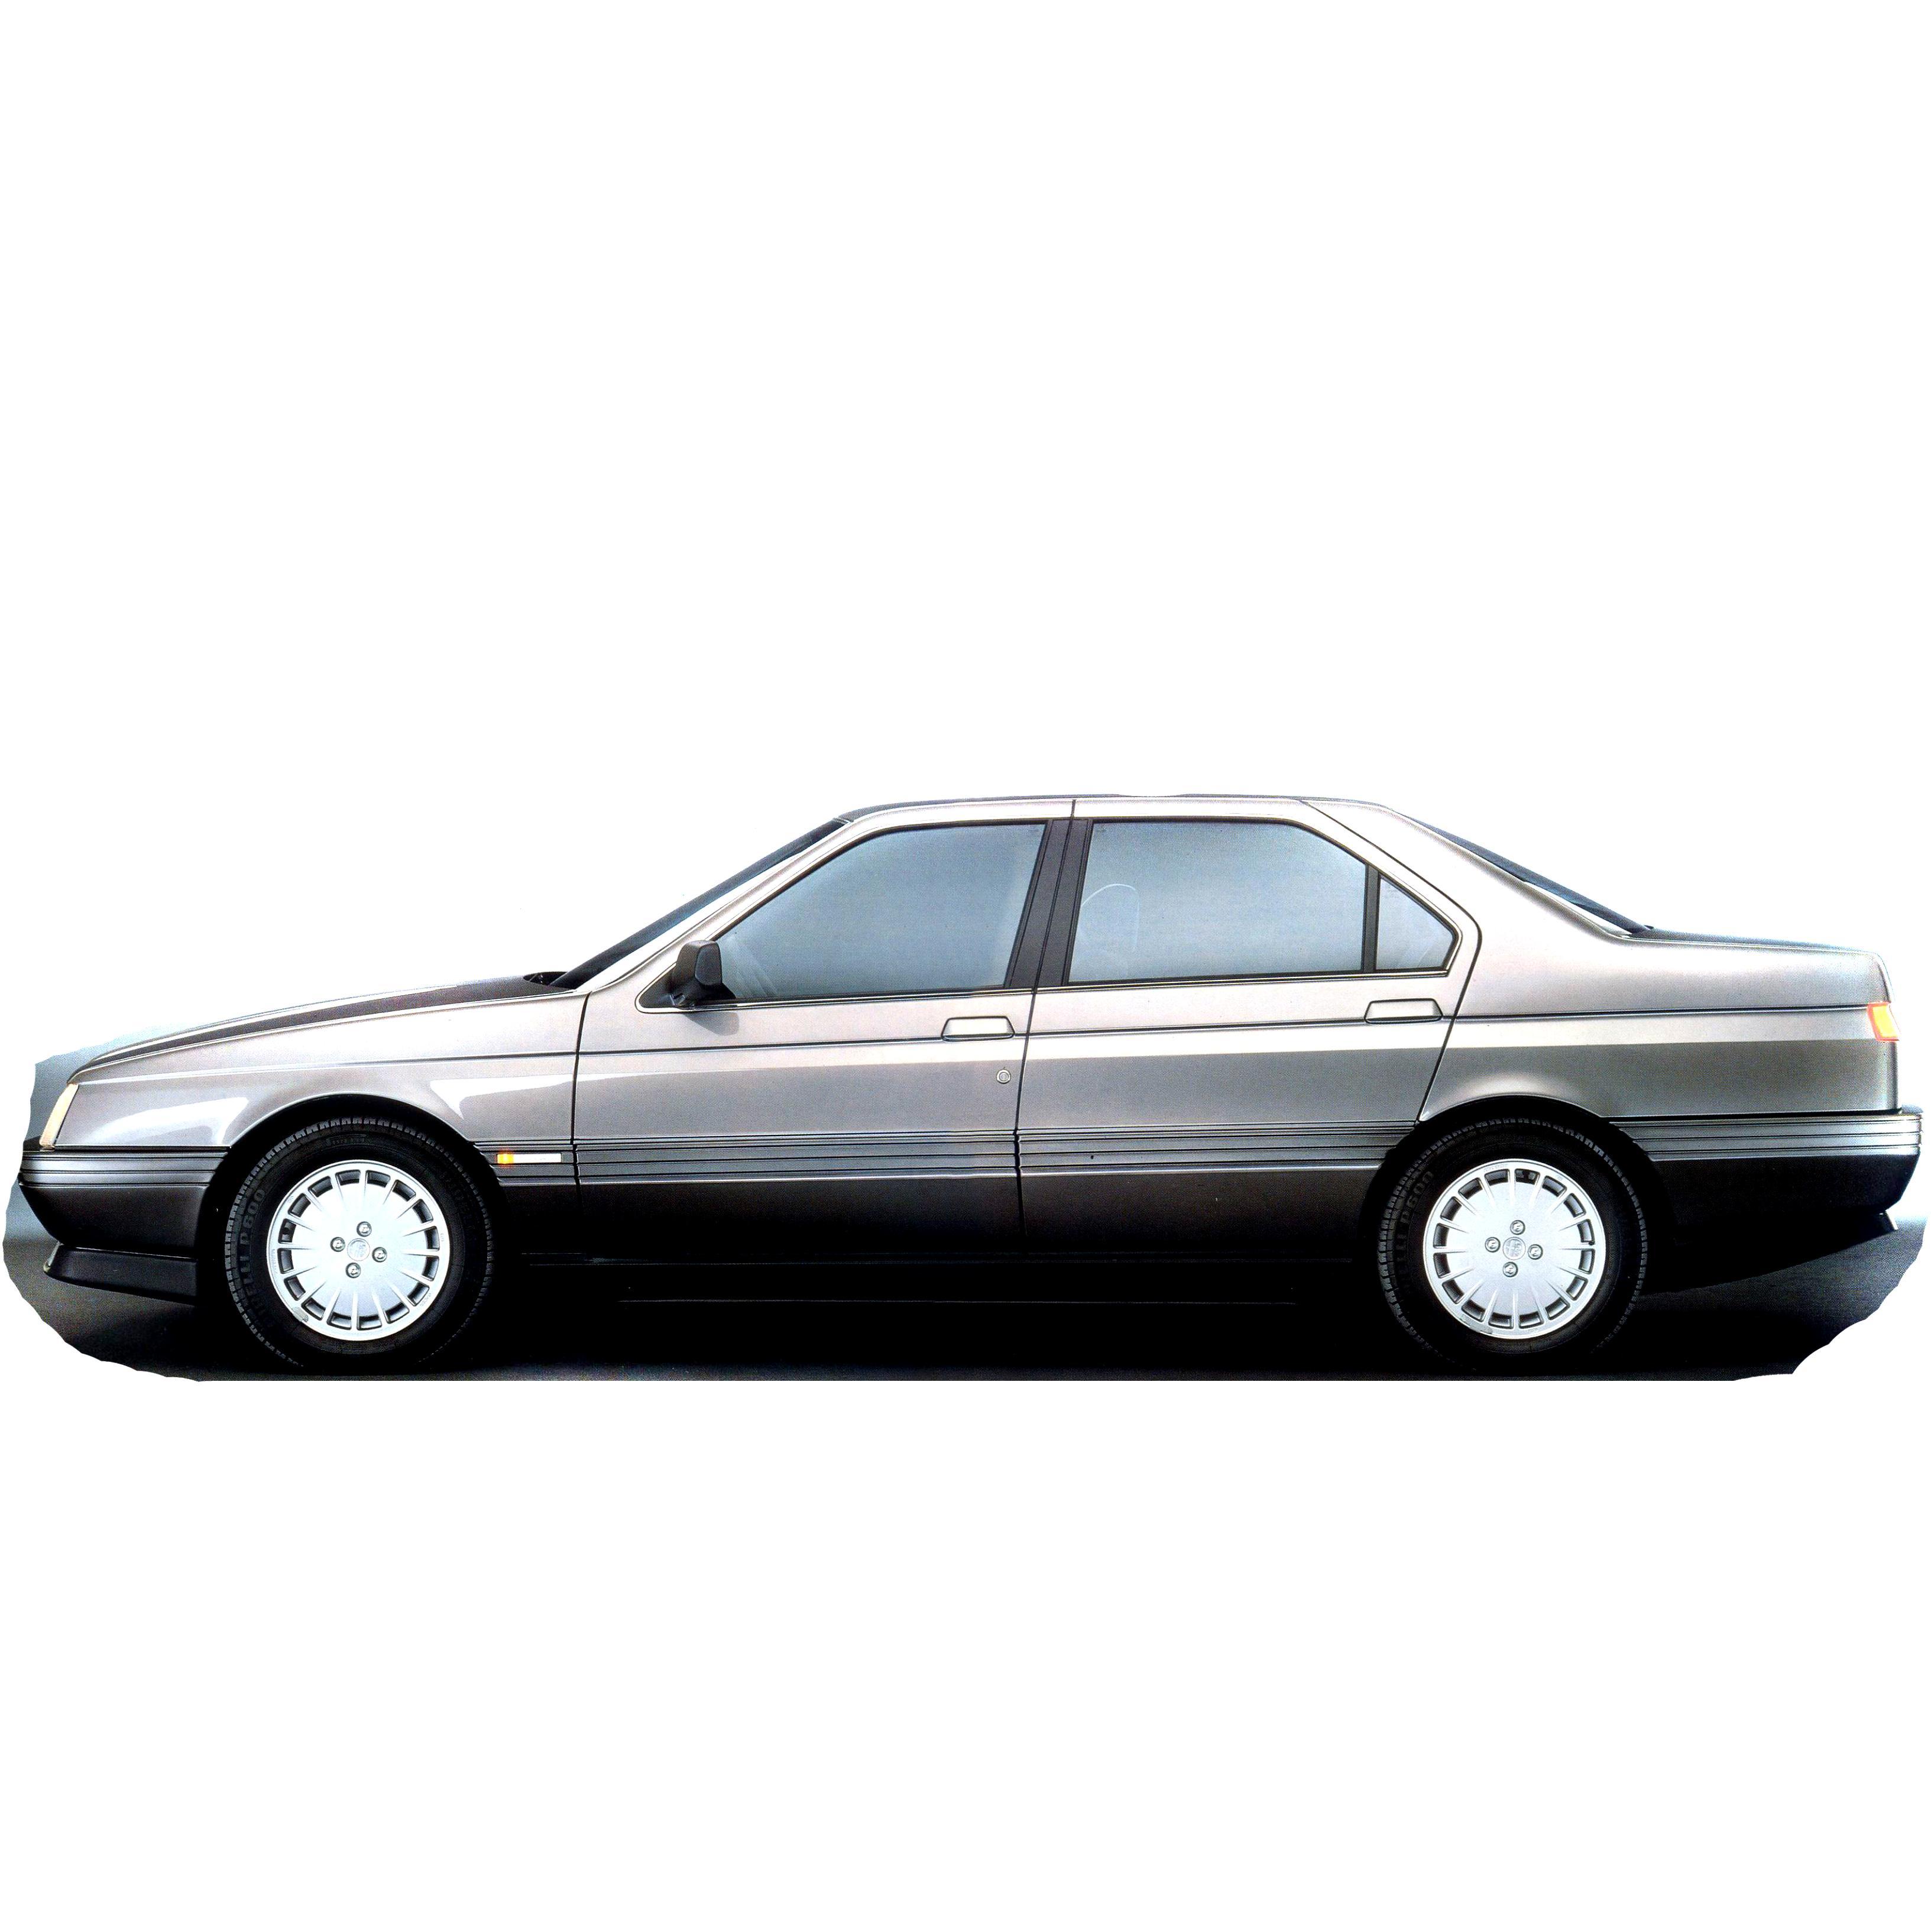 Alfa Romeo 164 1988 On MotoImg.com